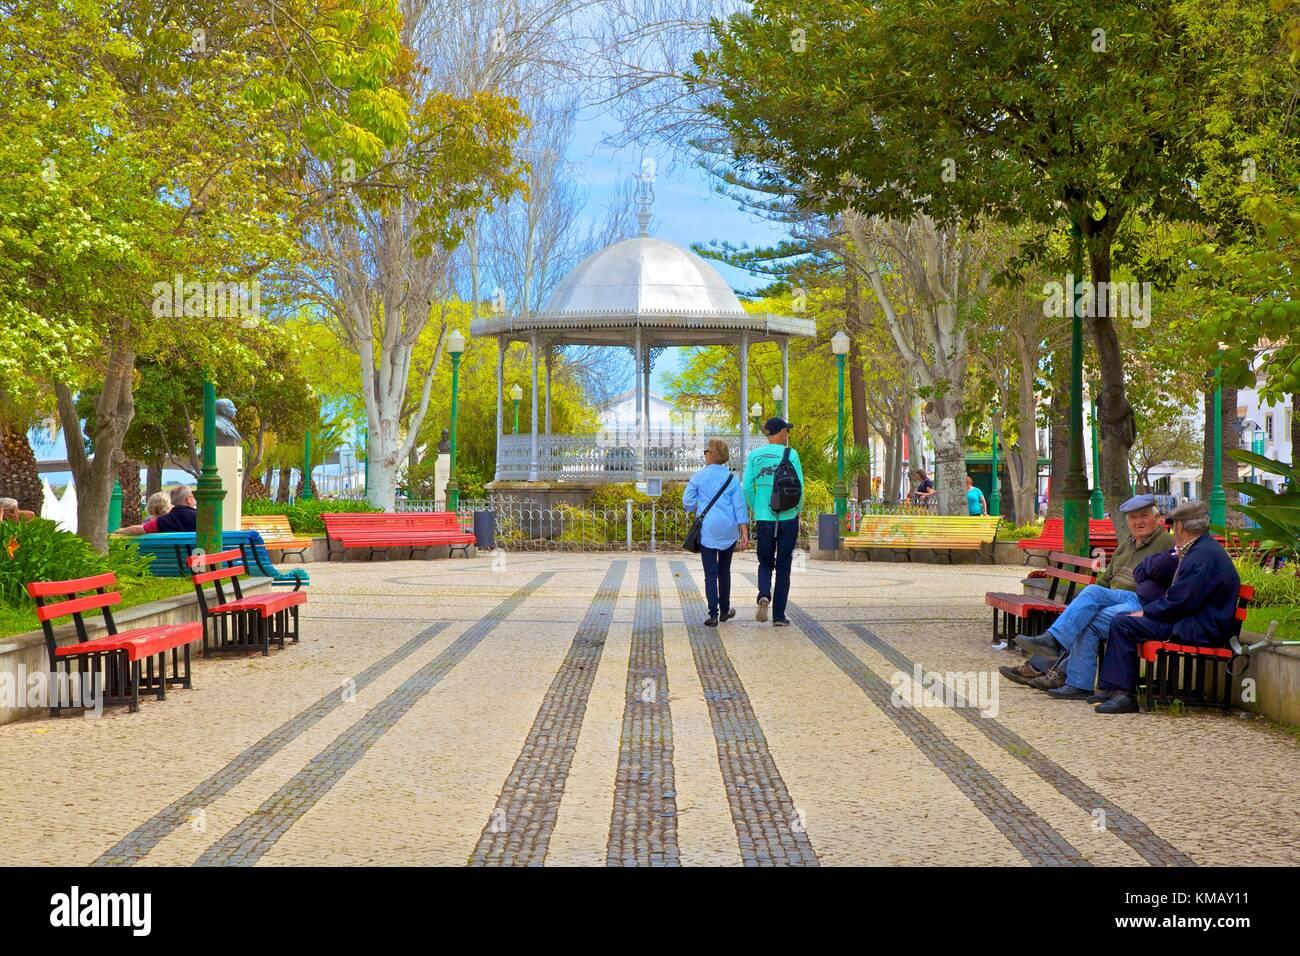 Garden and Bandstand, Tavira, Eastern Algarve, Algarve, Portugal, Europe Stock Photo